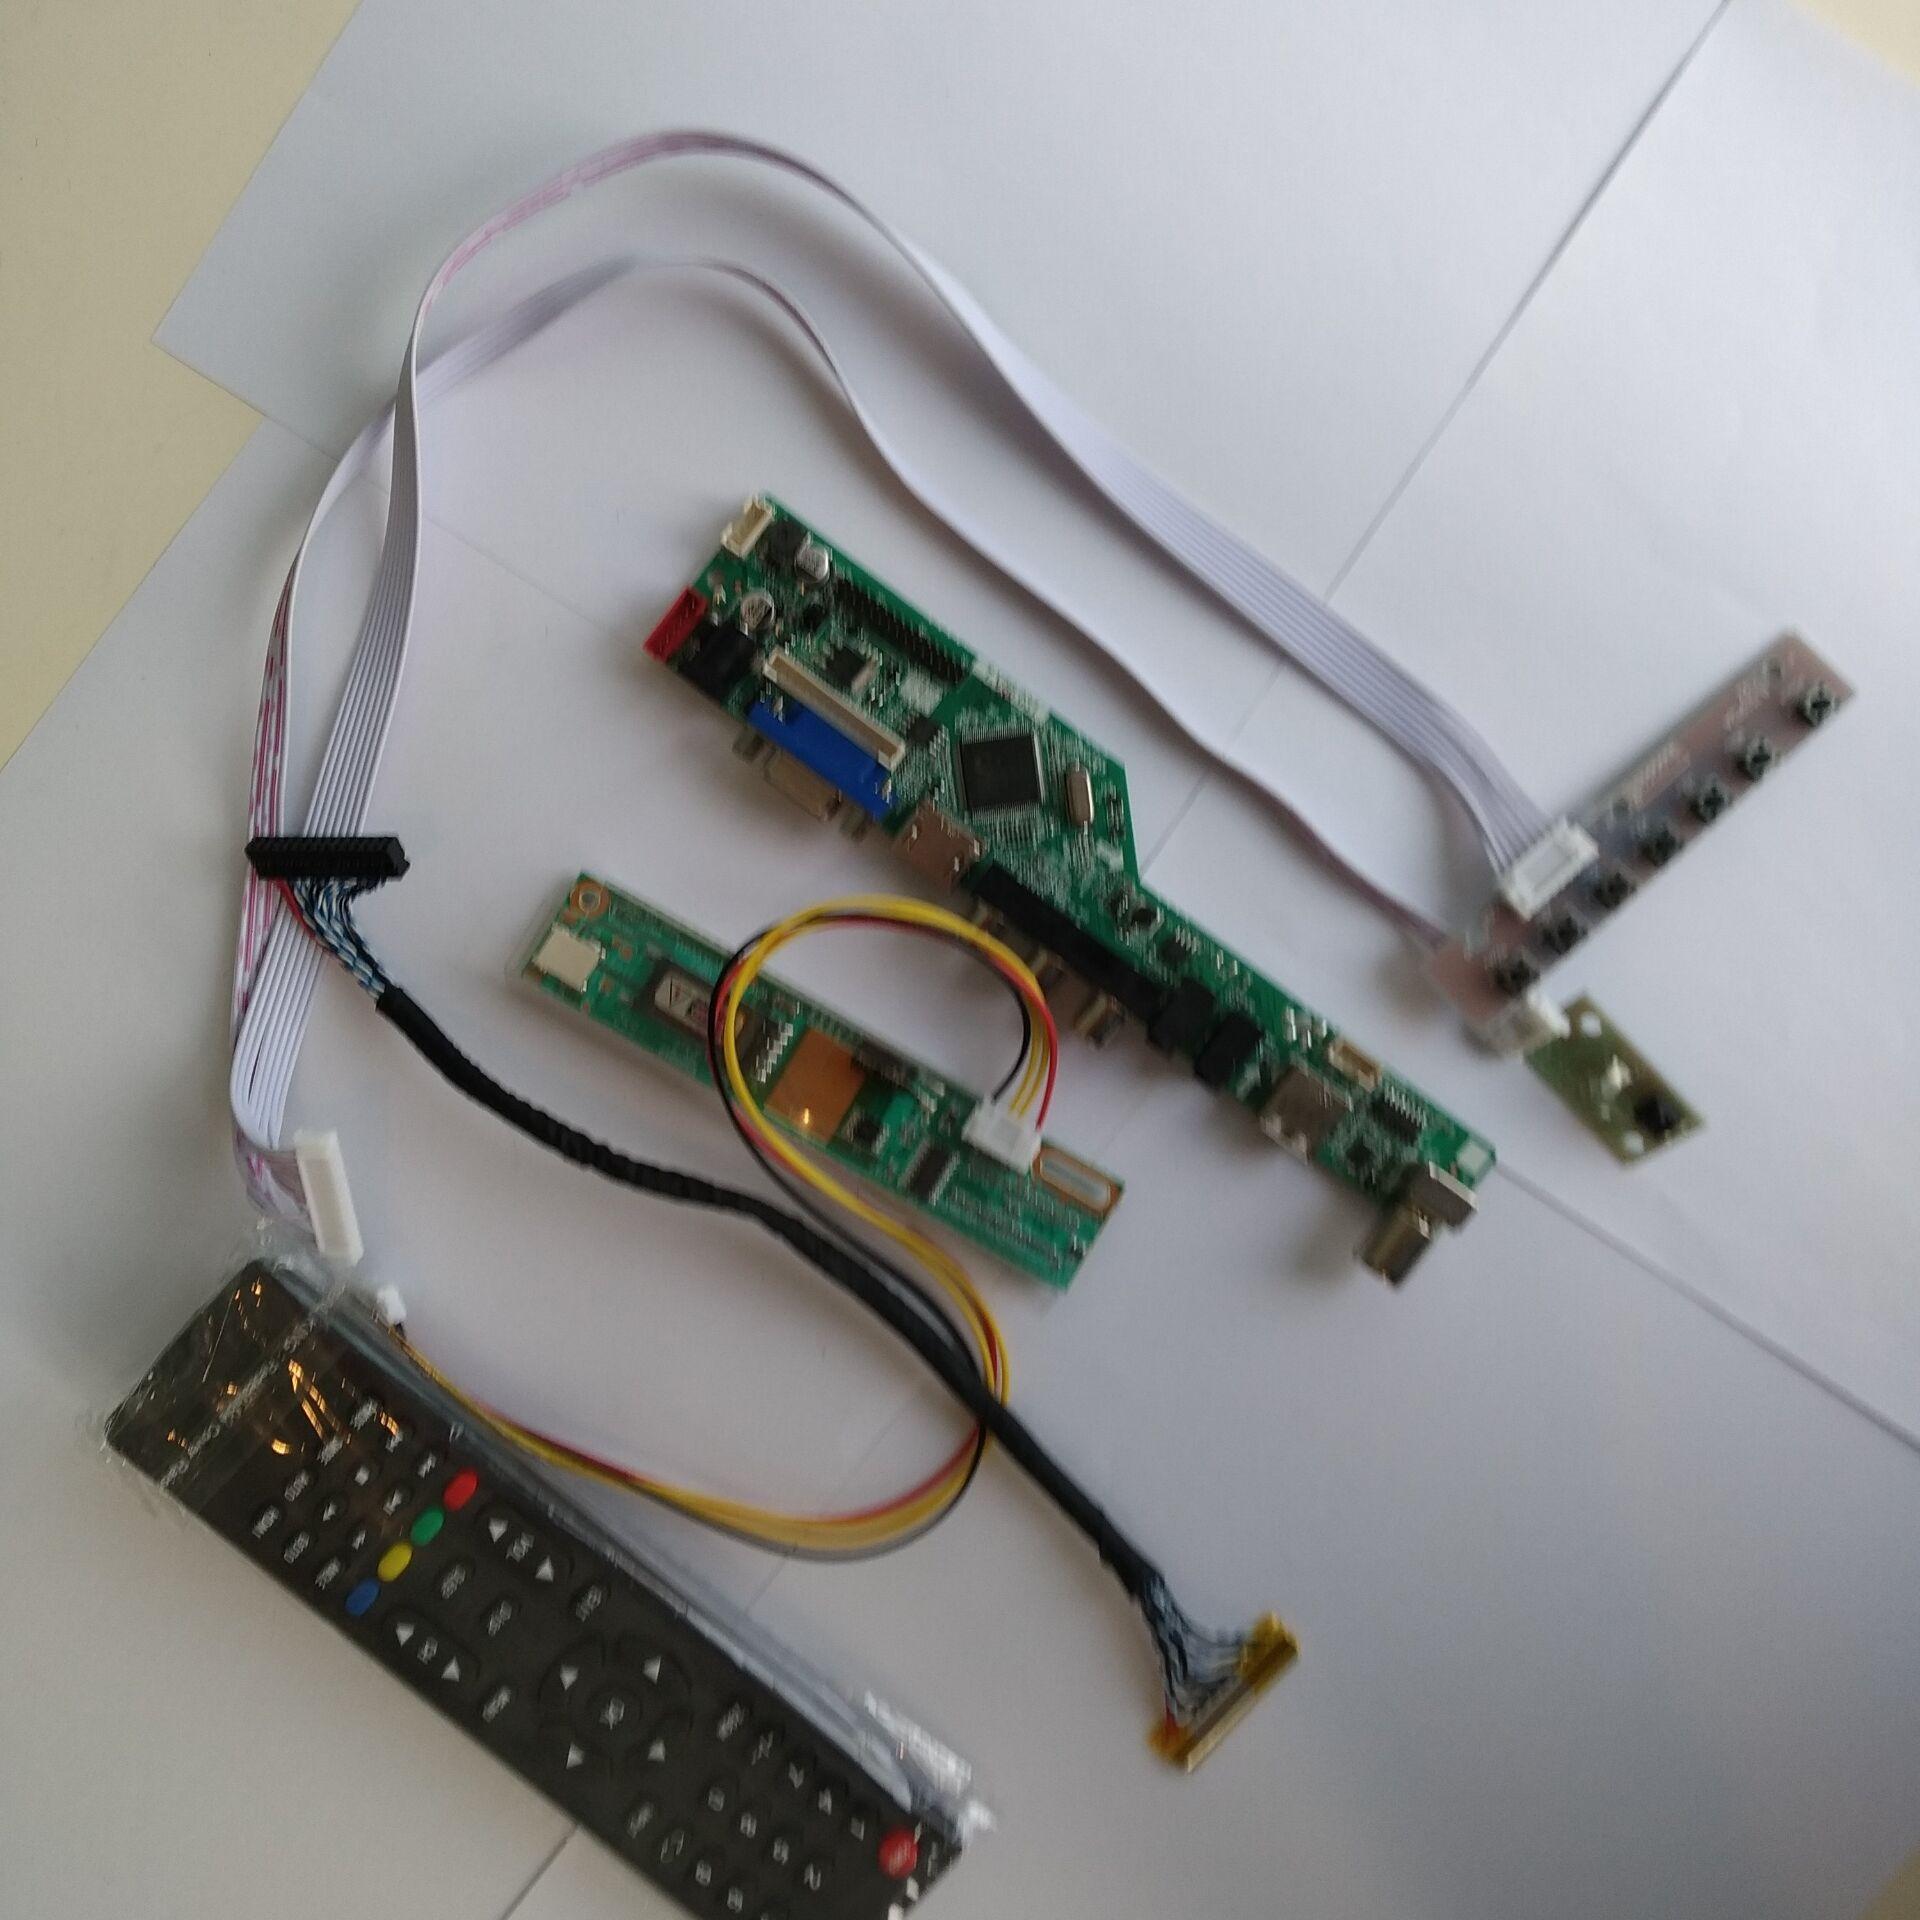 TV USB LED LCD AV VGA HDMI AUDIO Controller Board kit For CLAA154WB05AN 1280*800 15.4 Screen Display MonitorTV USB LED LCD AV VGA HDMI AUDIO Controller Board kit For CLAA154WB05AN 1280*800 15.4 Screen Display Monitor